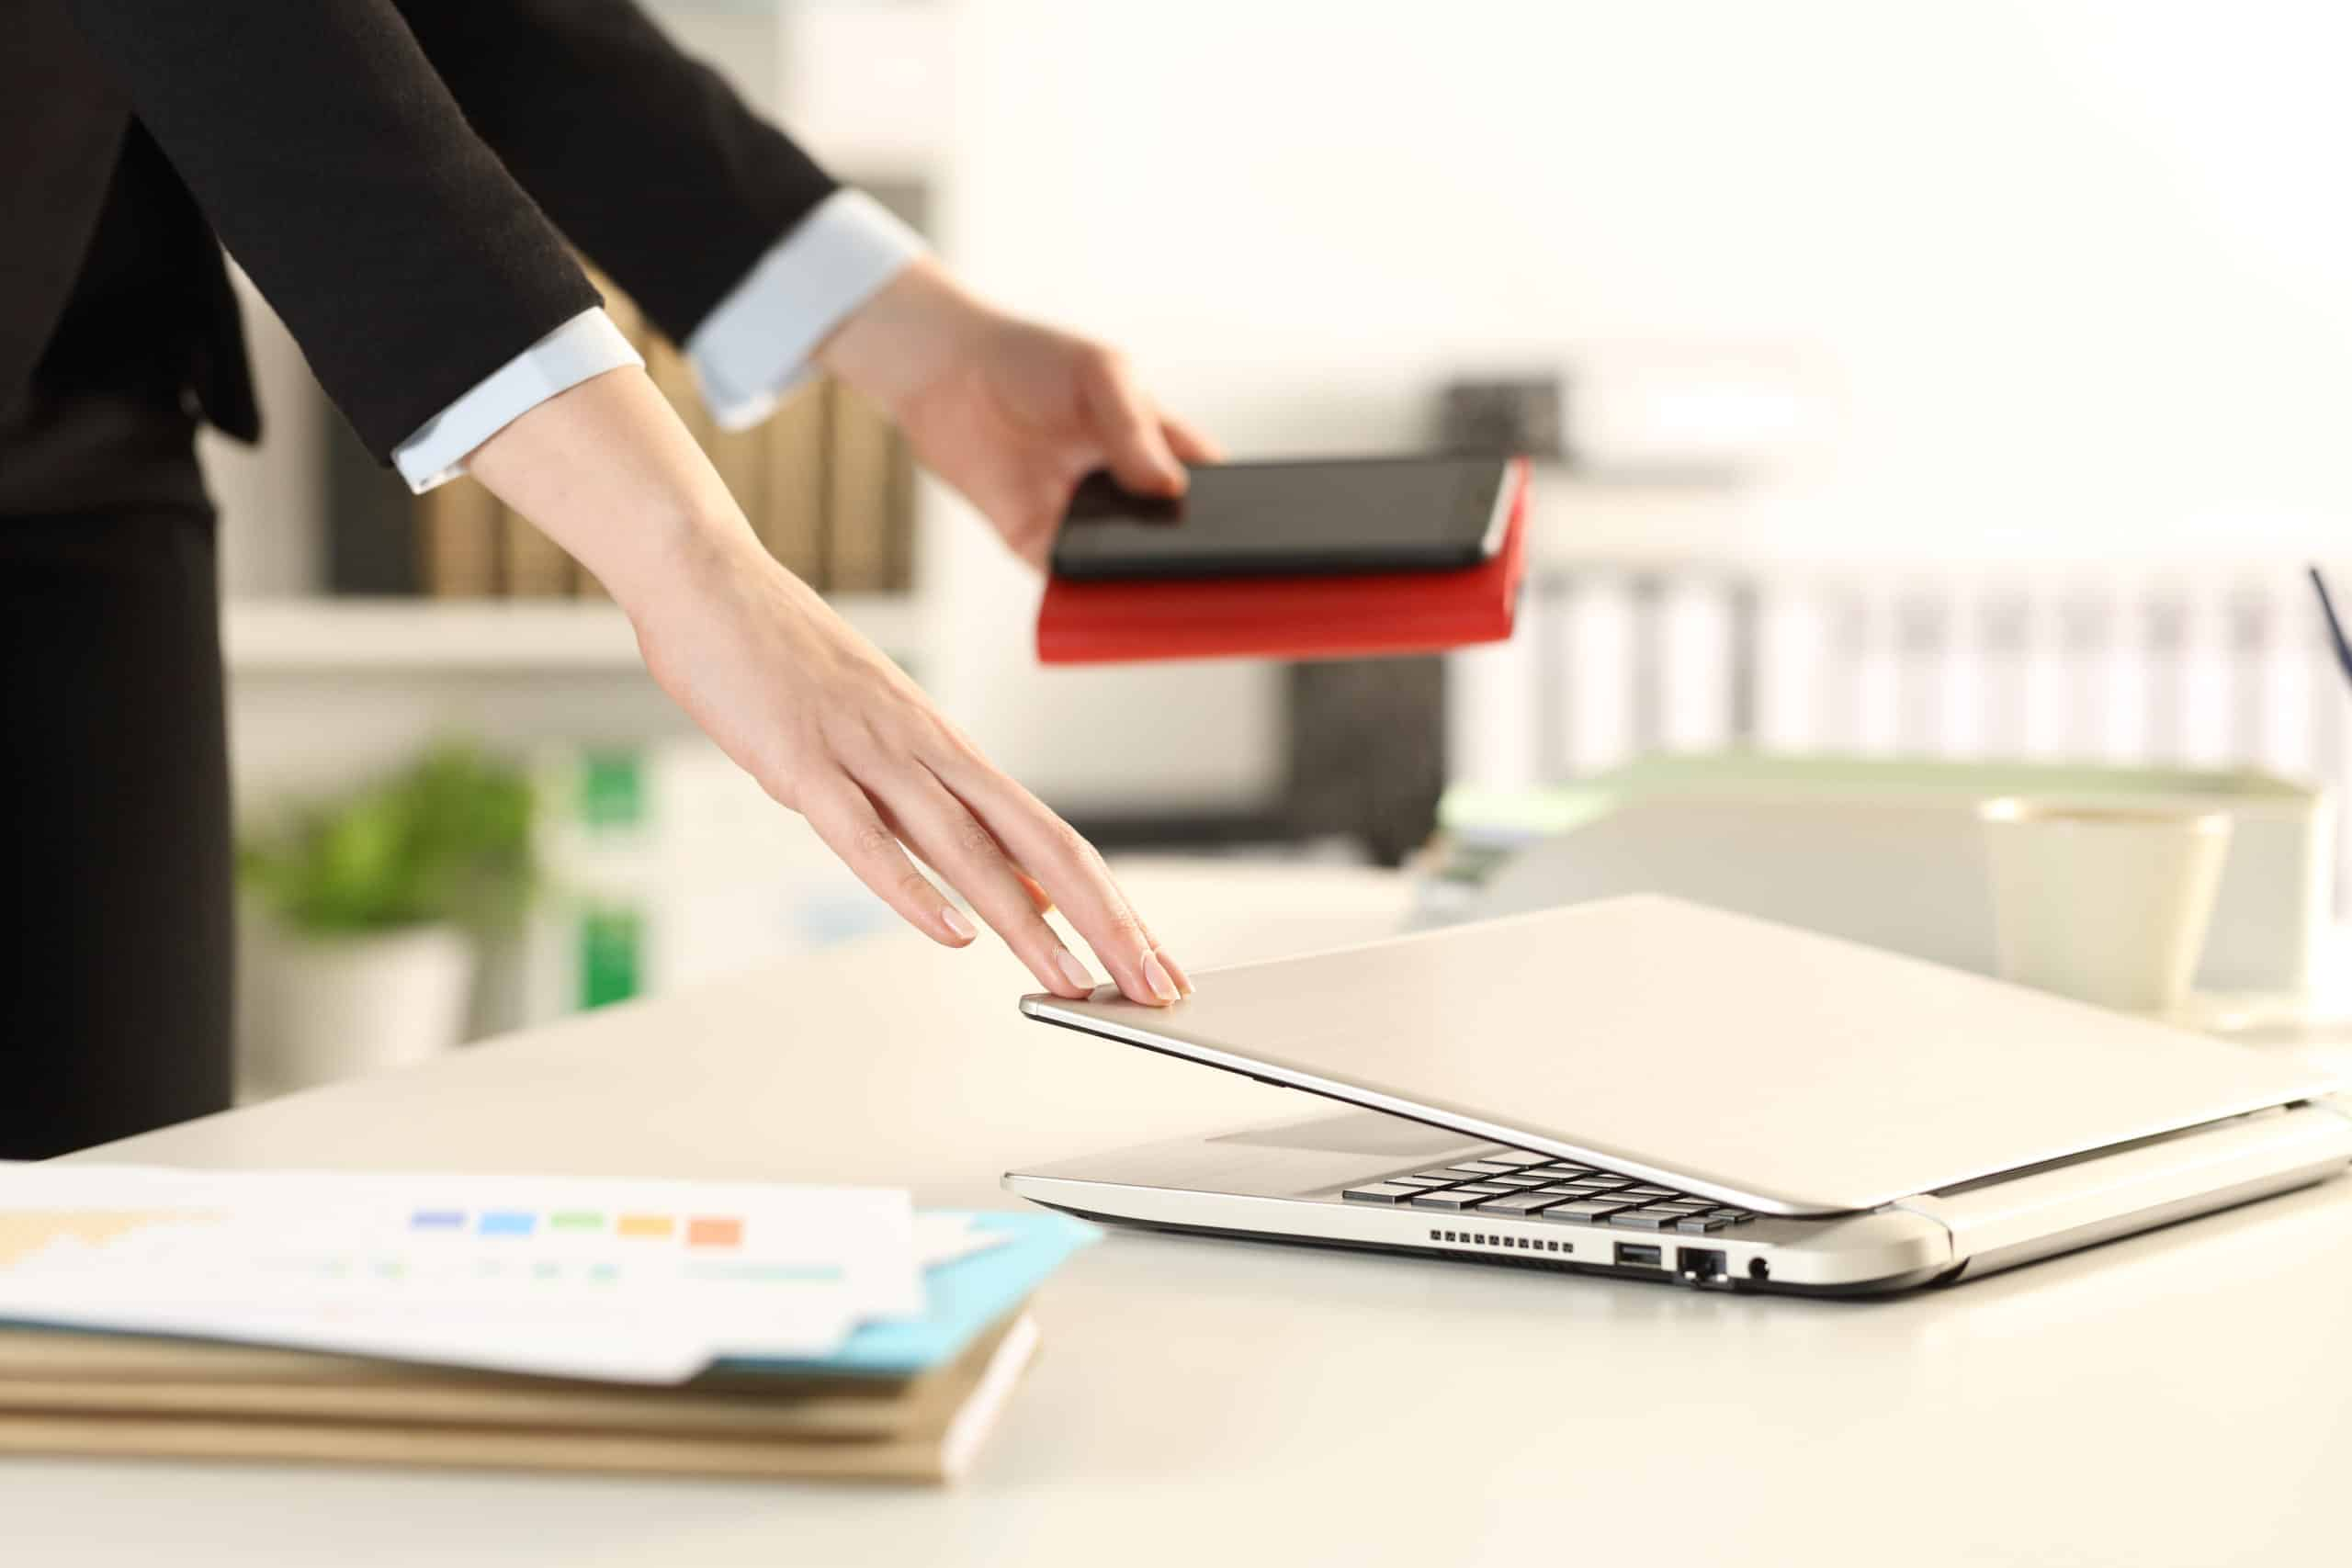 laptop closing